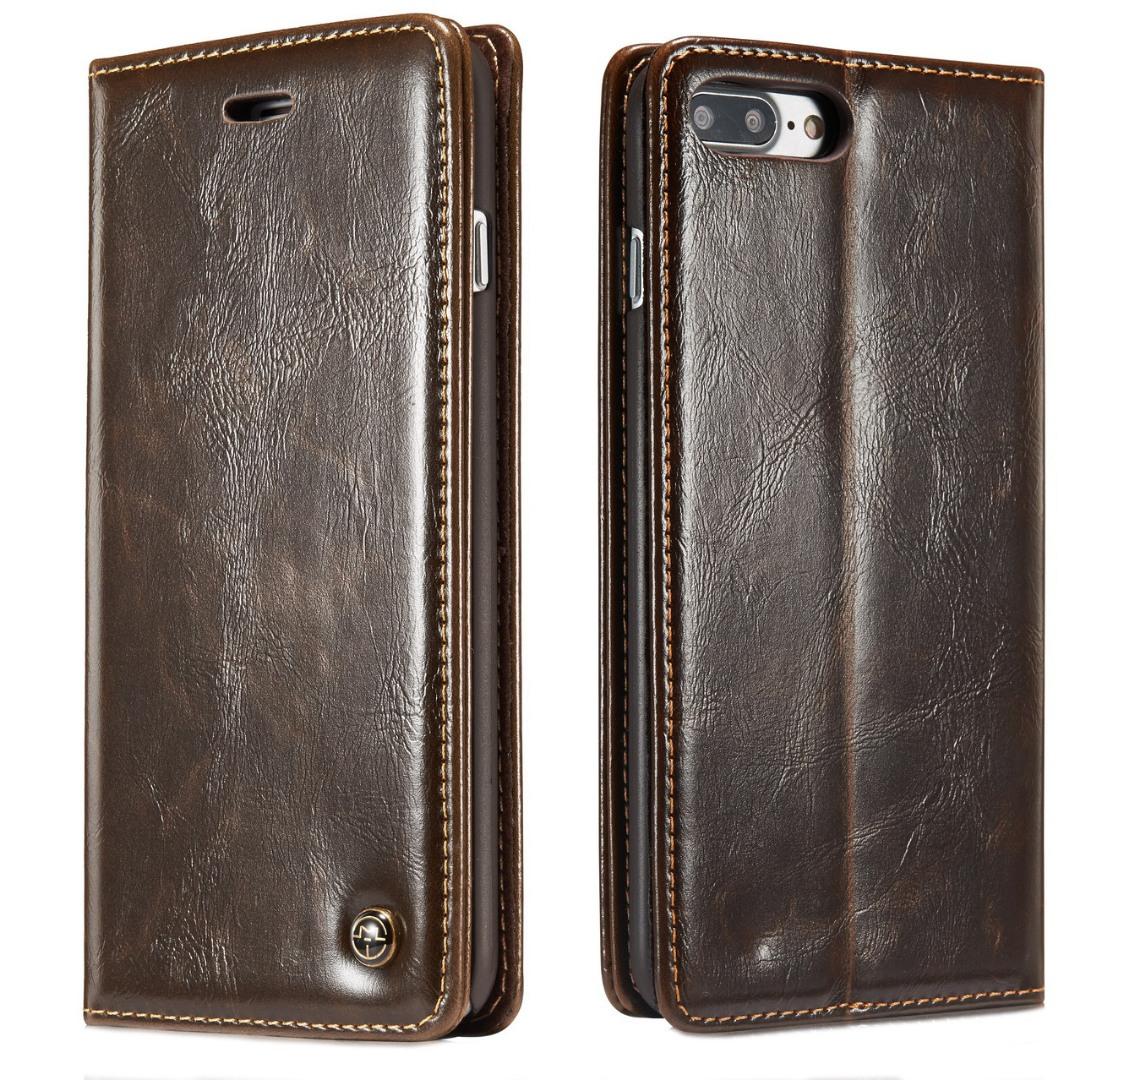 Husa piele fina, tip portofel, stand, inchidere magnetica, iPhone 8 Plus / 7 Plus - CaseMe, Maro coffee